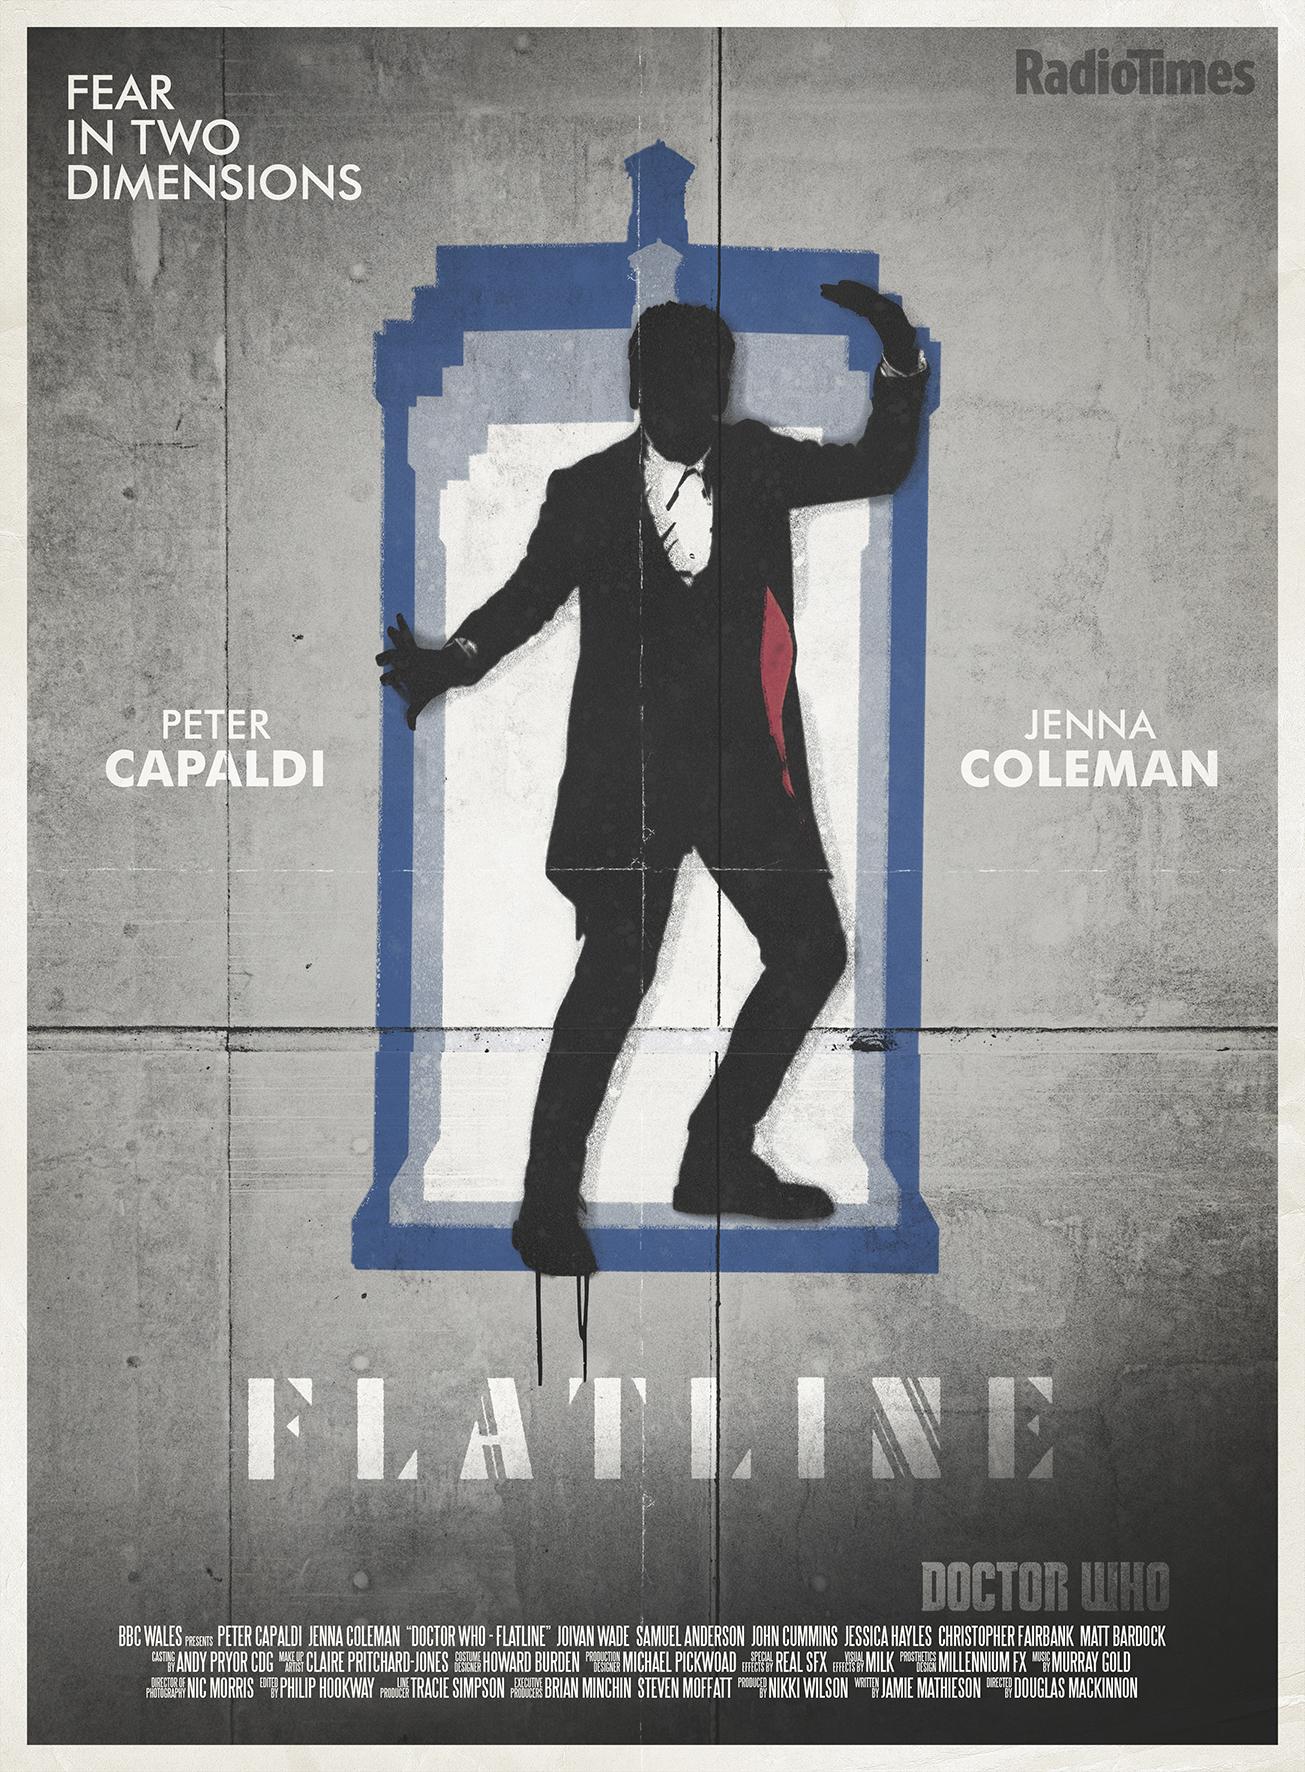 Doctor Who: Stuart Manning's Flatline Poster